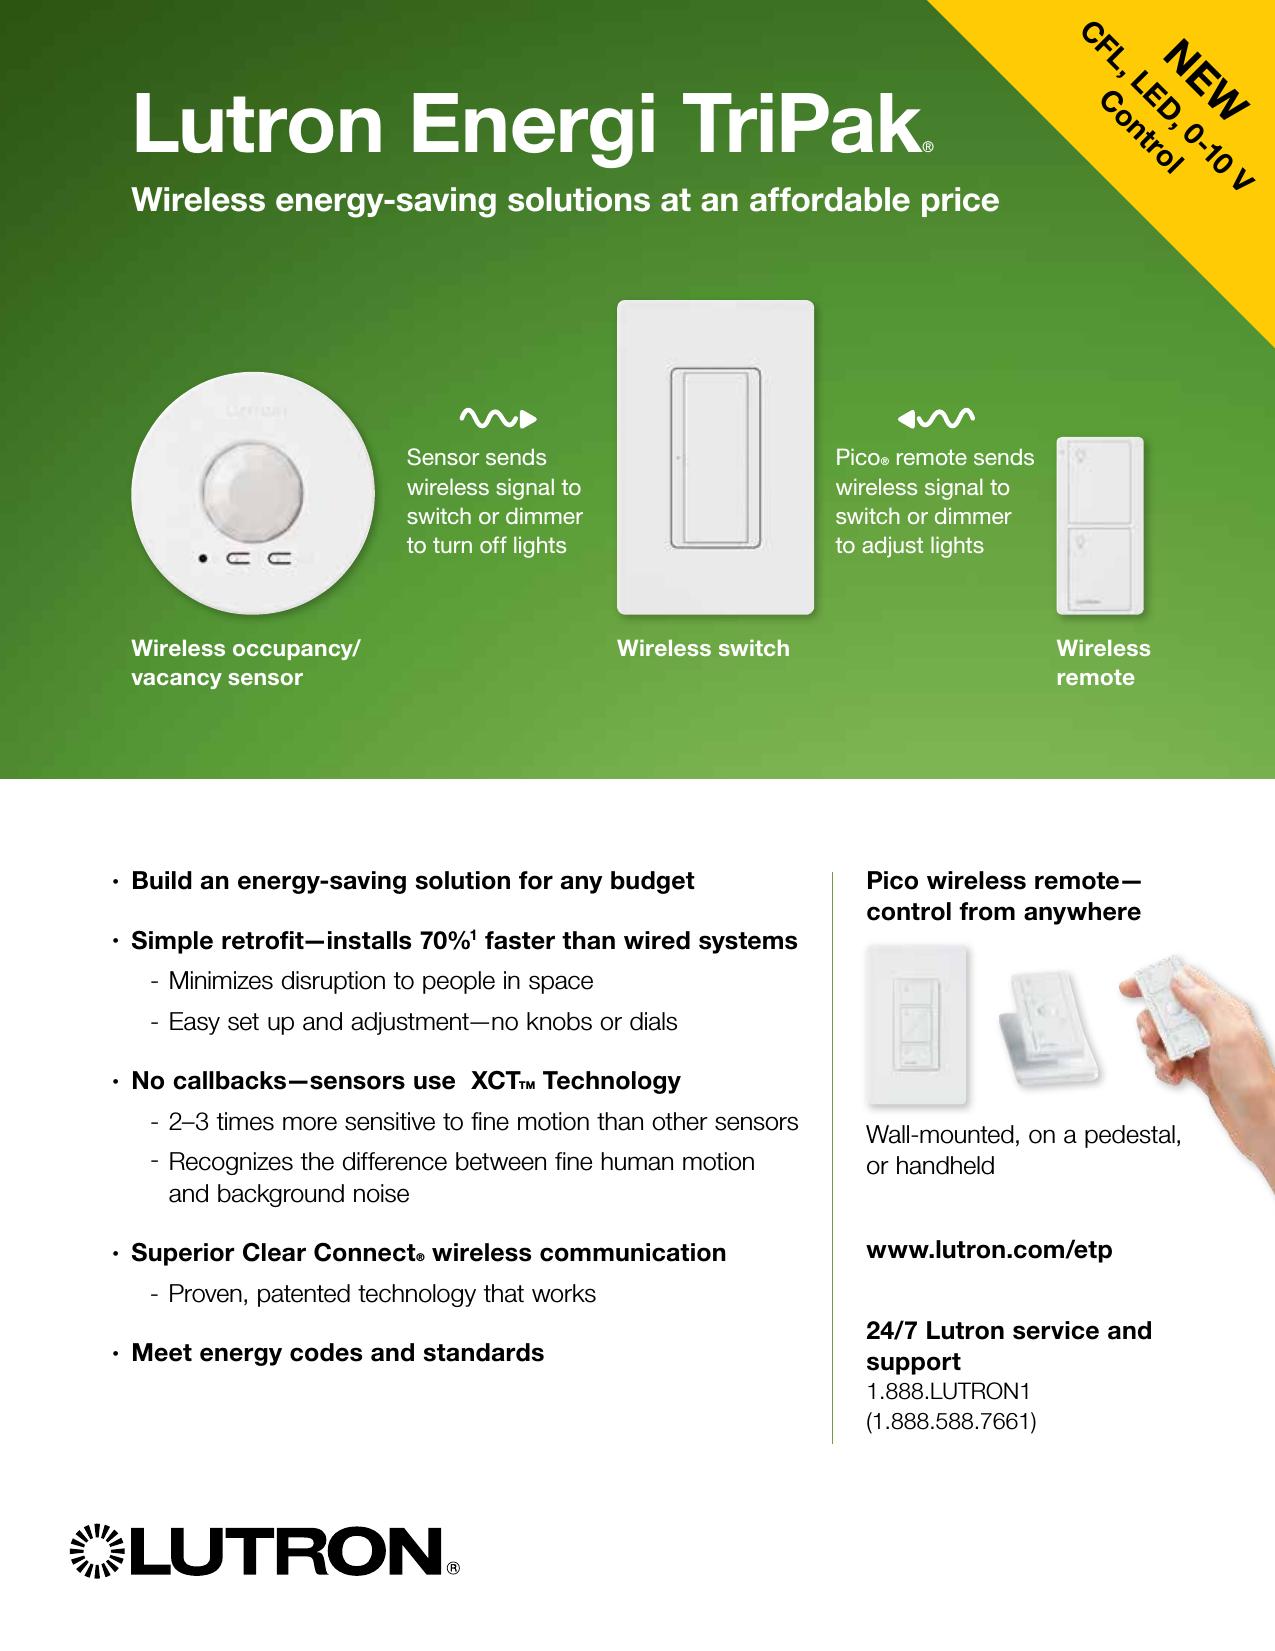 Lutron Energi Tripak Quick Install Guide 1000417475 Catalog Dimming Ballast Wiring Diagram Ehdt832mu210